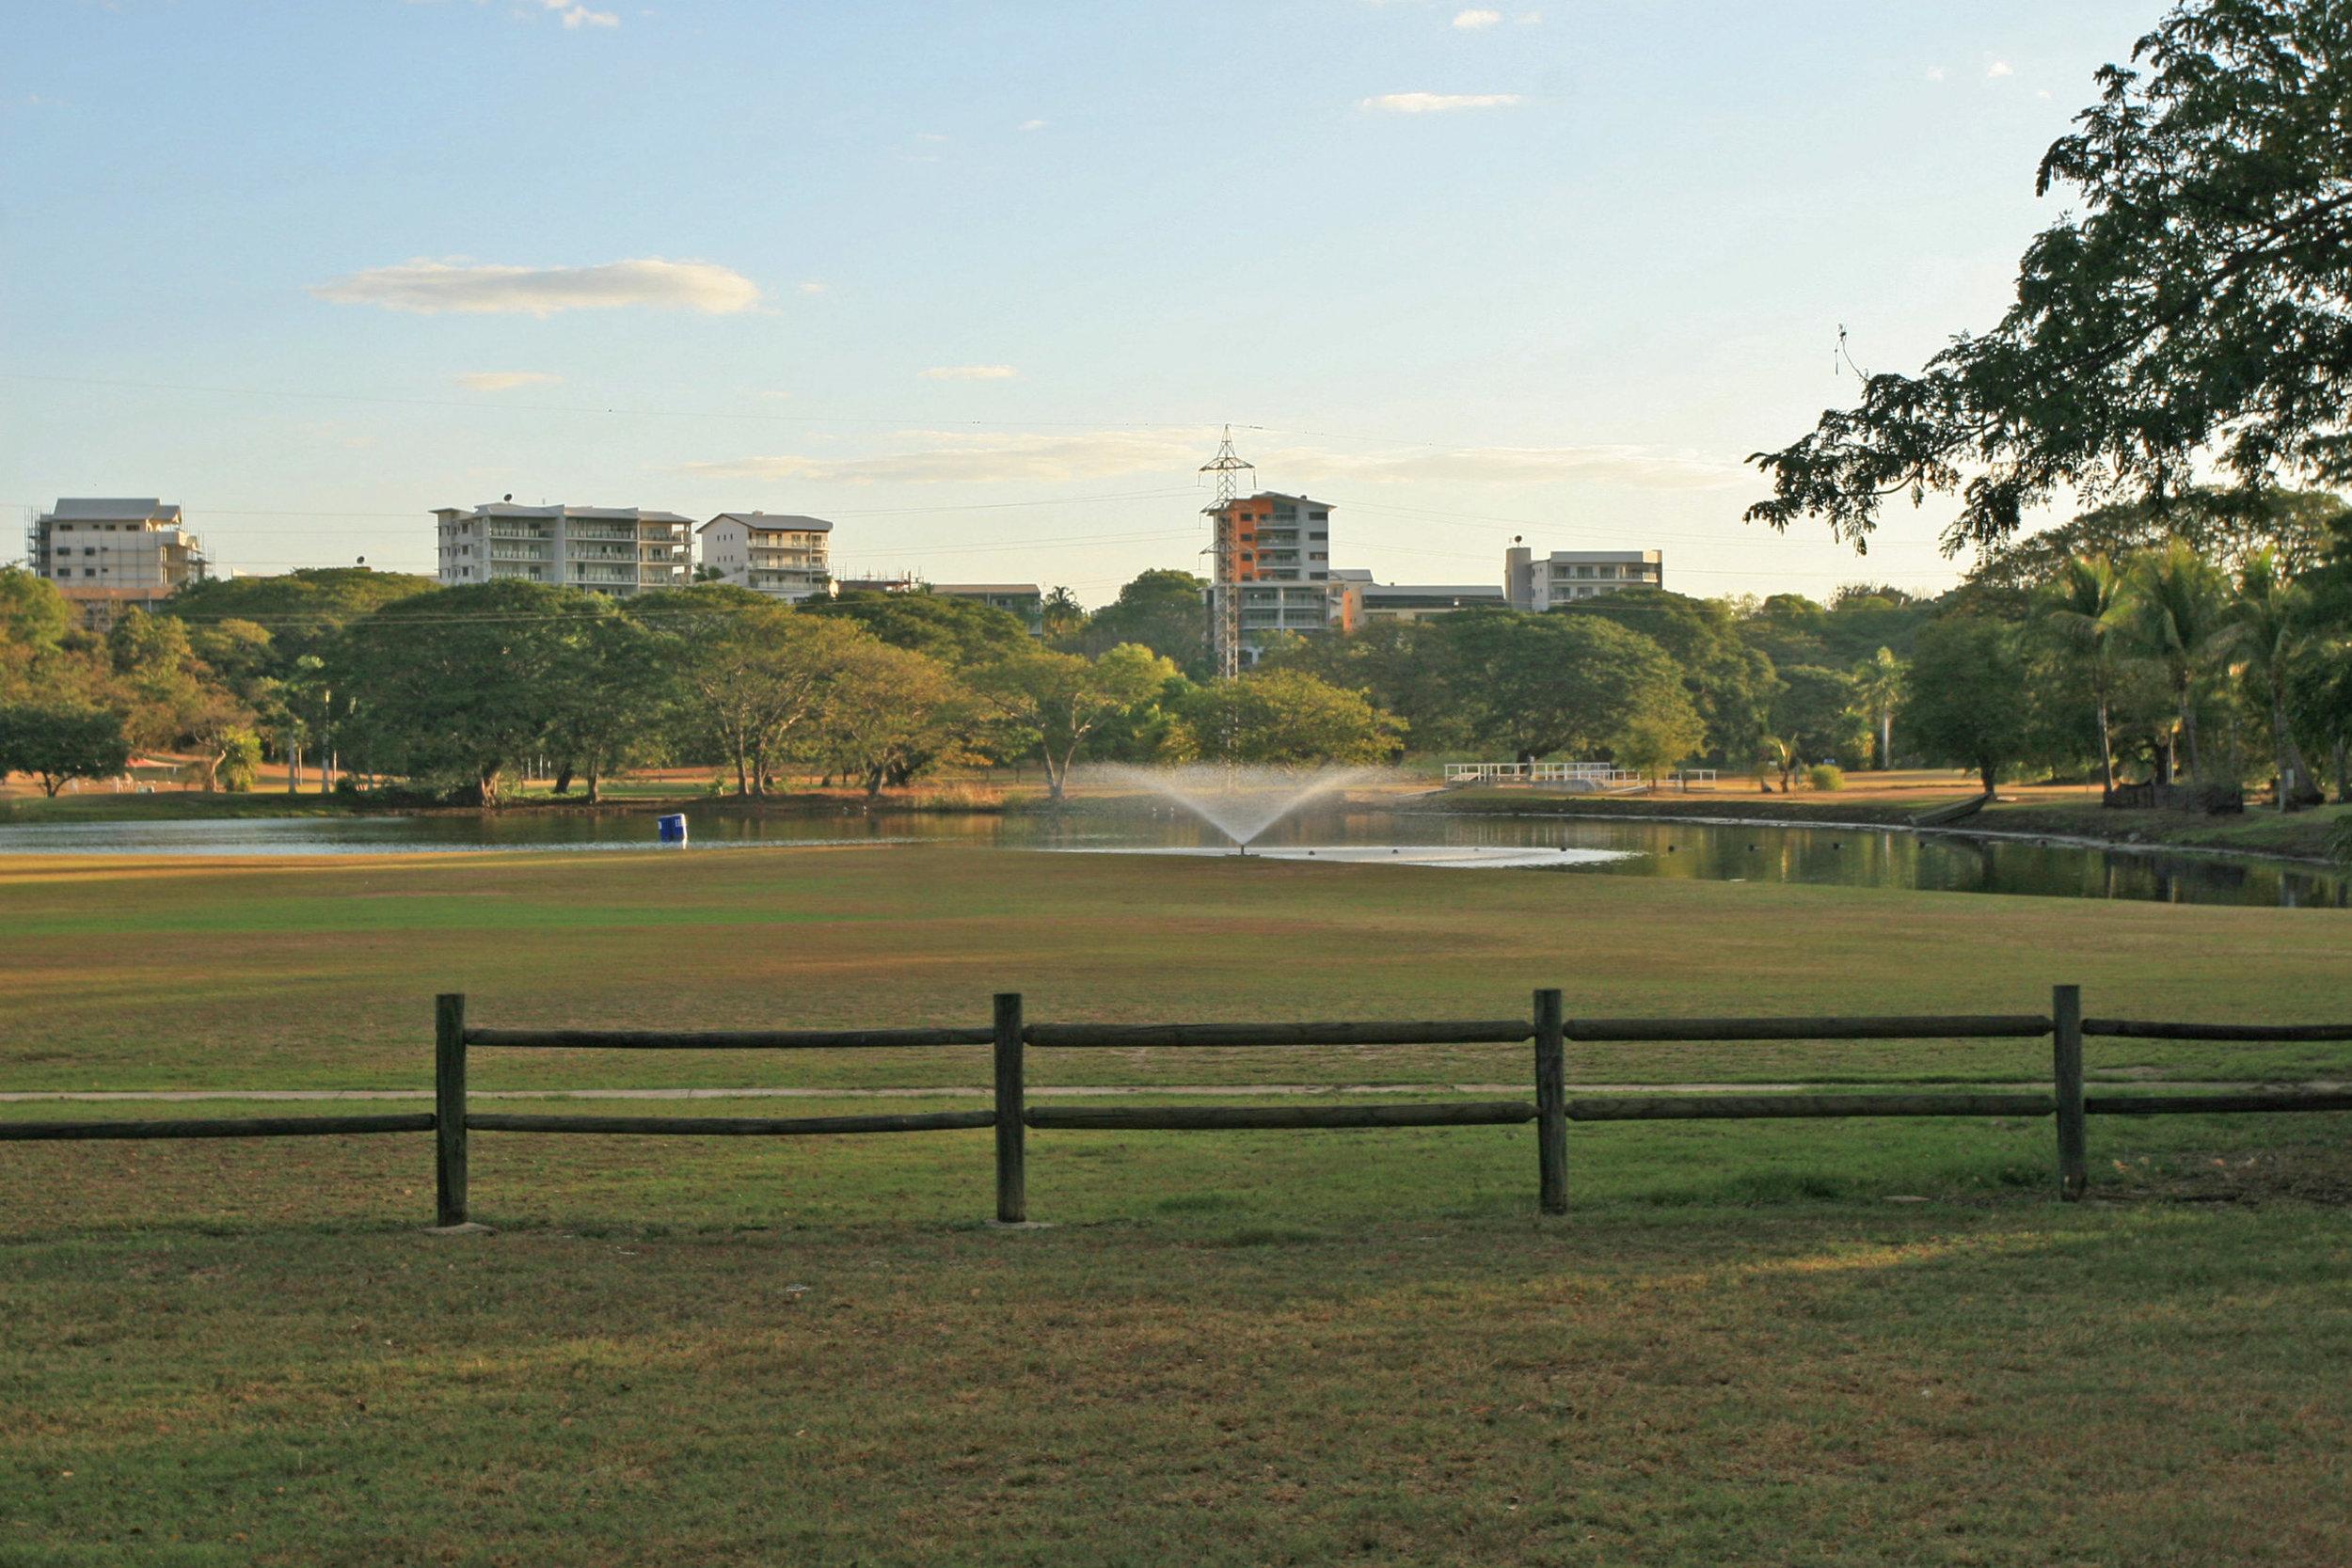 Fig 20: City park in Darwin